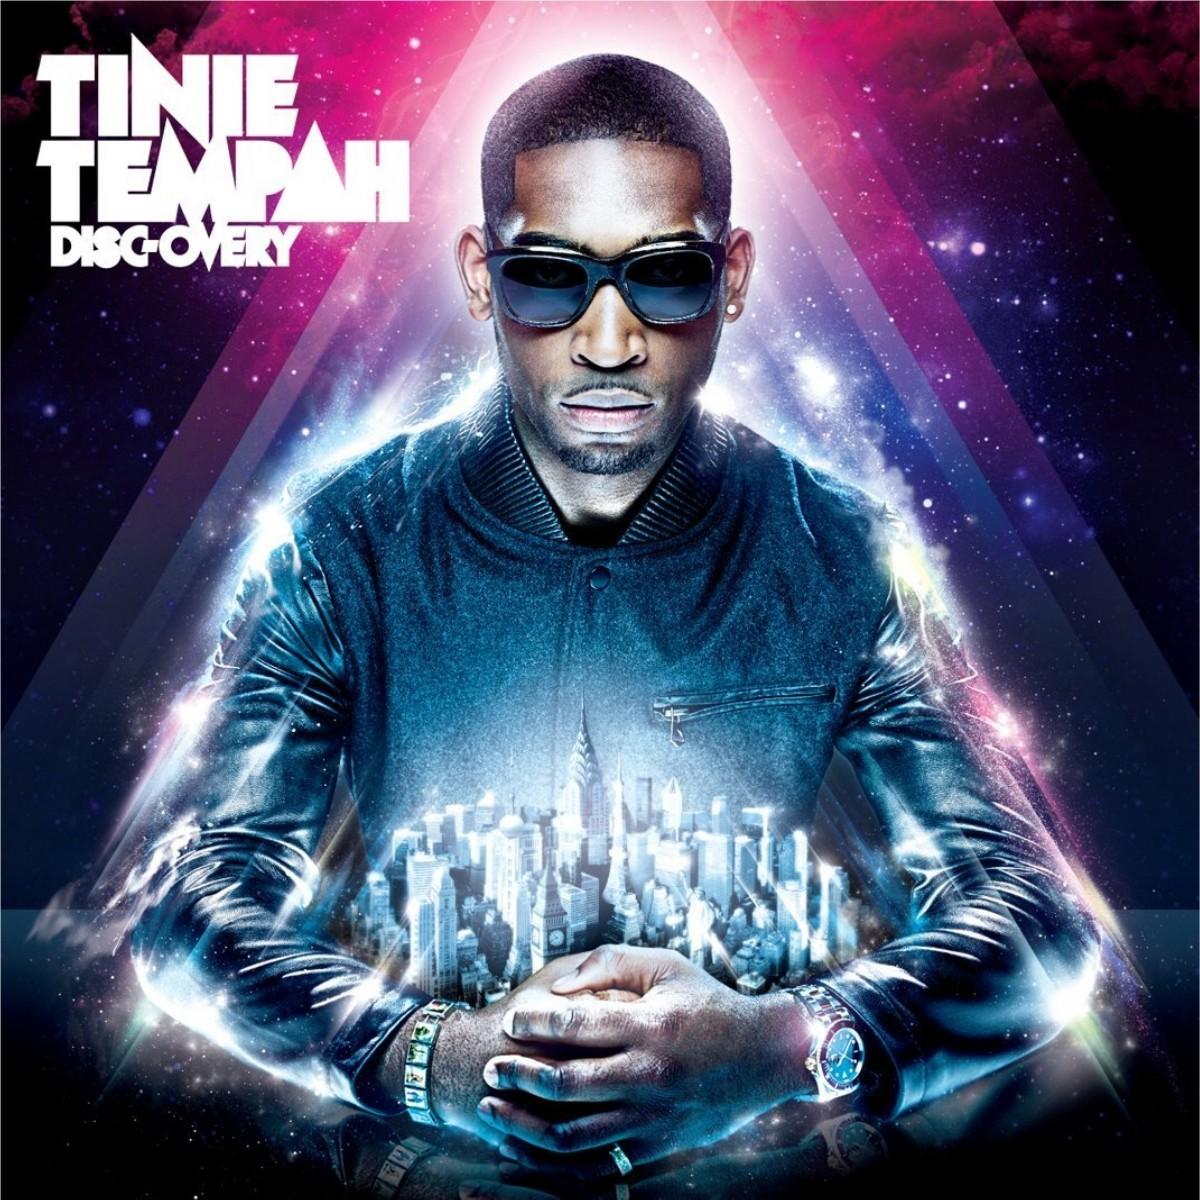 http://1.bp.blogspot.com/_BcHa1wsK9kY/TLdNSFZQb1I/AAAAAAAAAZo/hA8eqQQE3Fc/s1600/Tinie+Tempah+-+Disc-Overy+(Official+Album+Cover).jpg